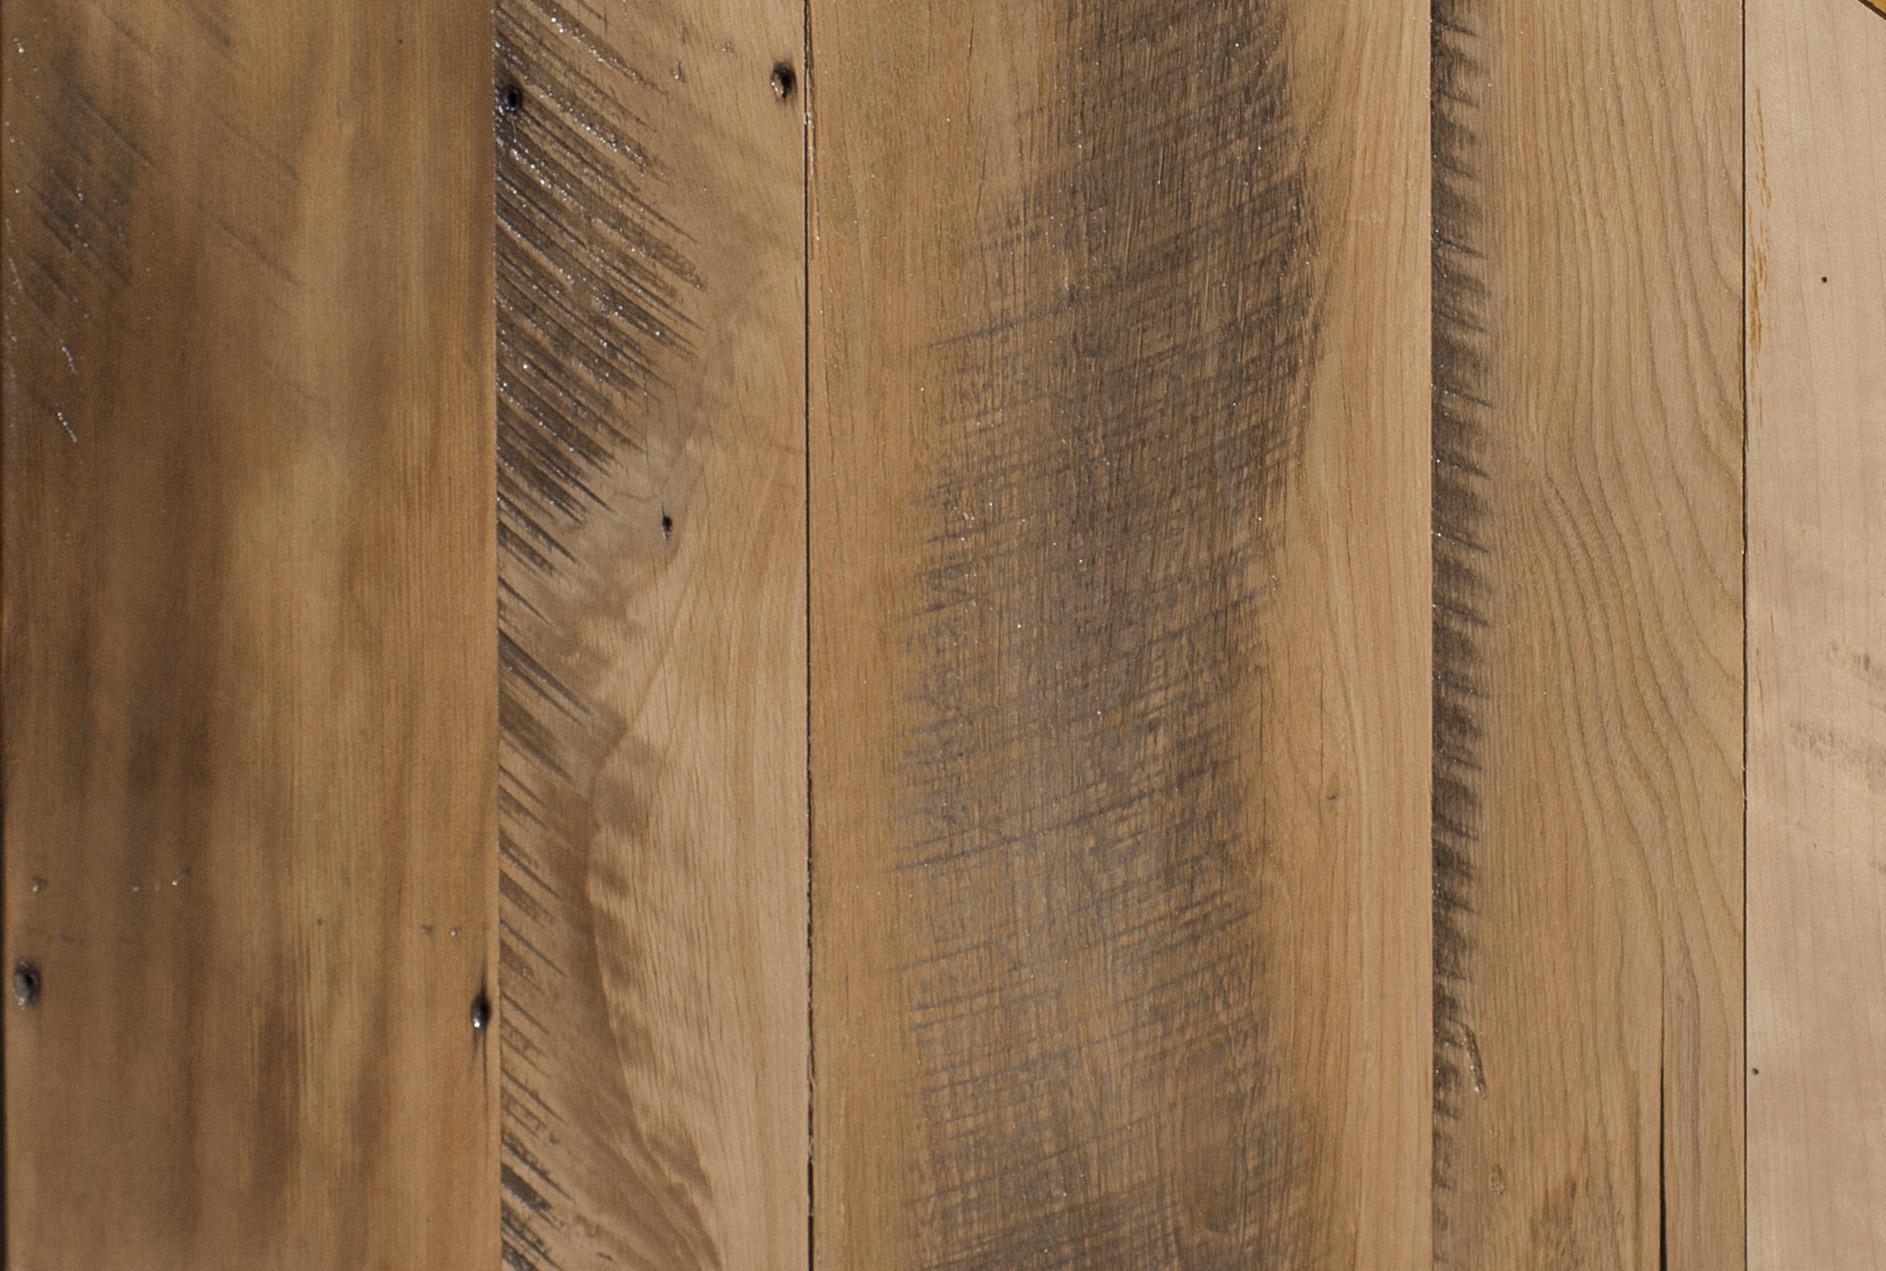 Skip Planing Reclaimed Wood